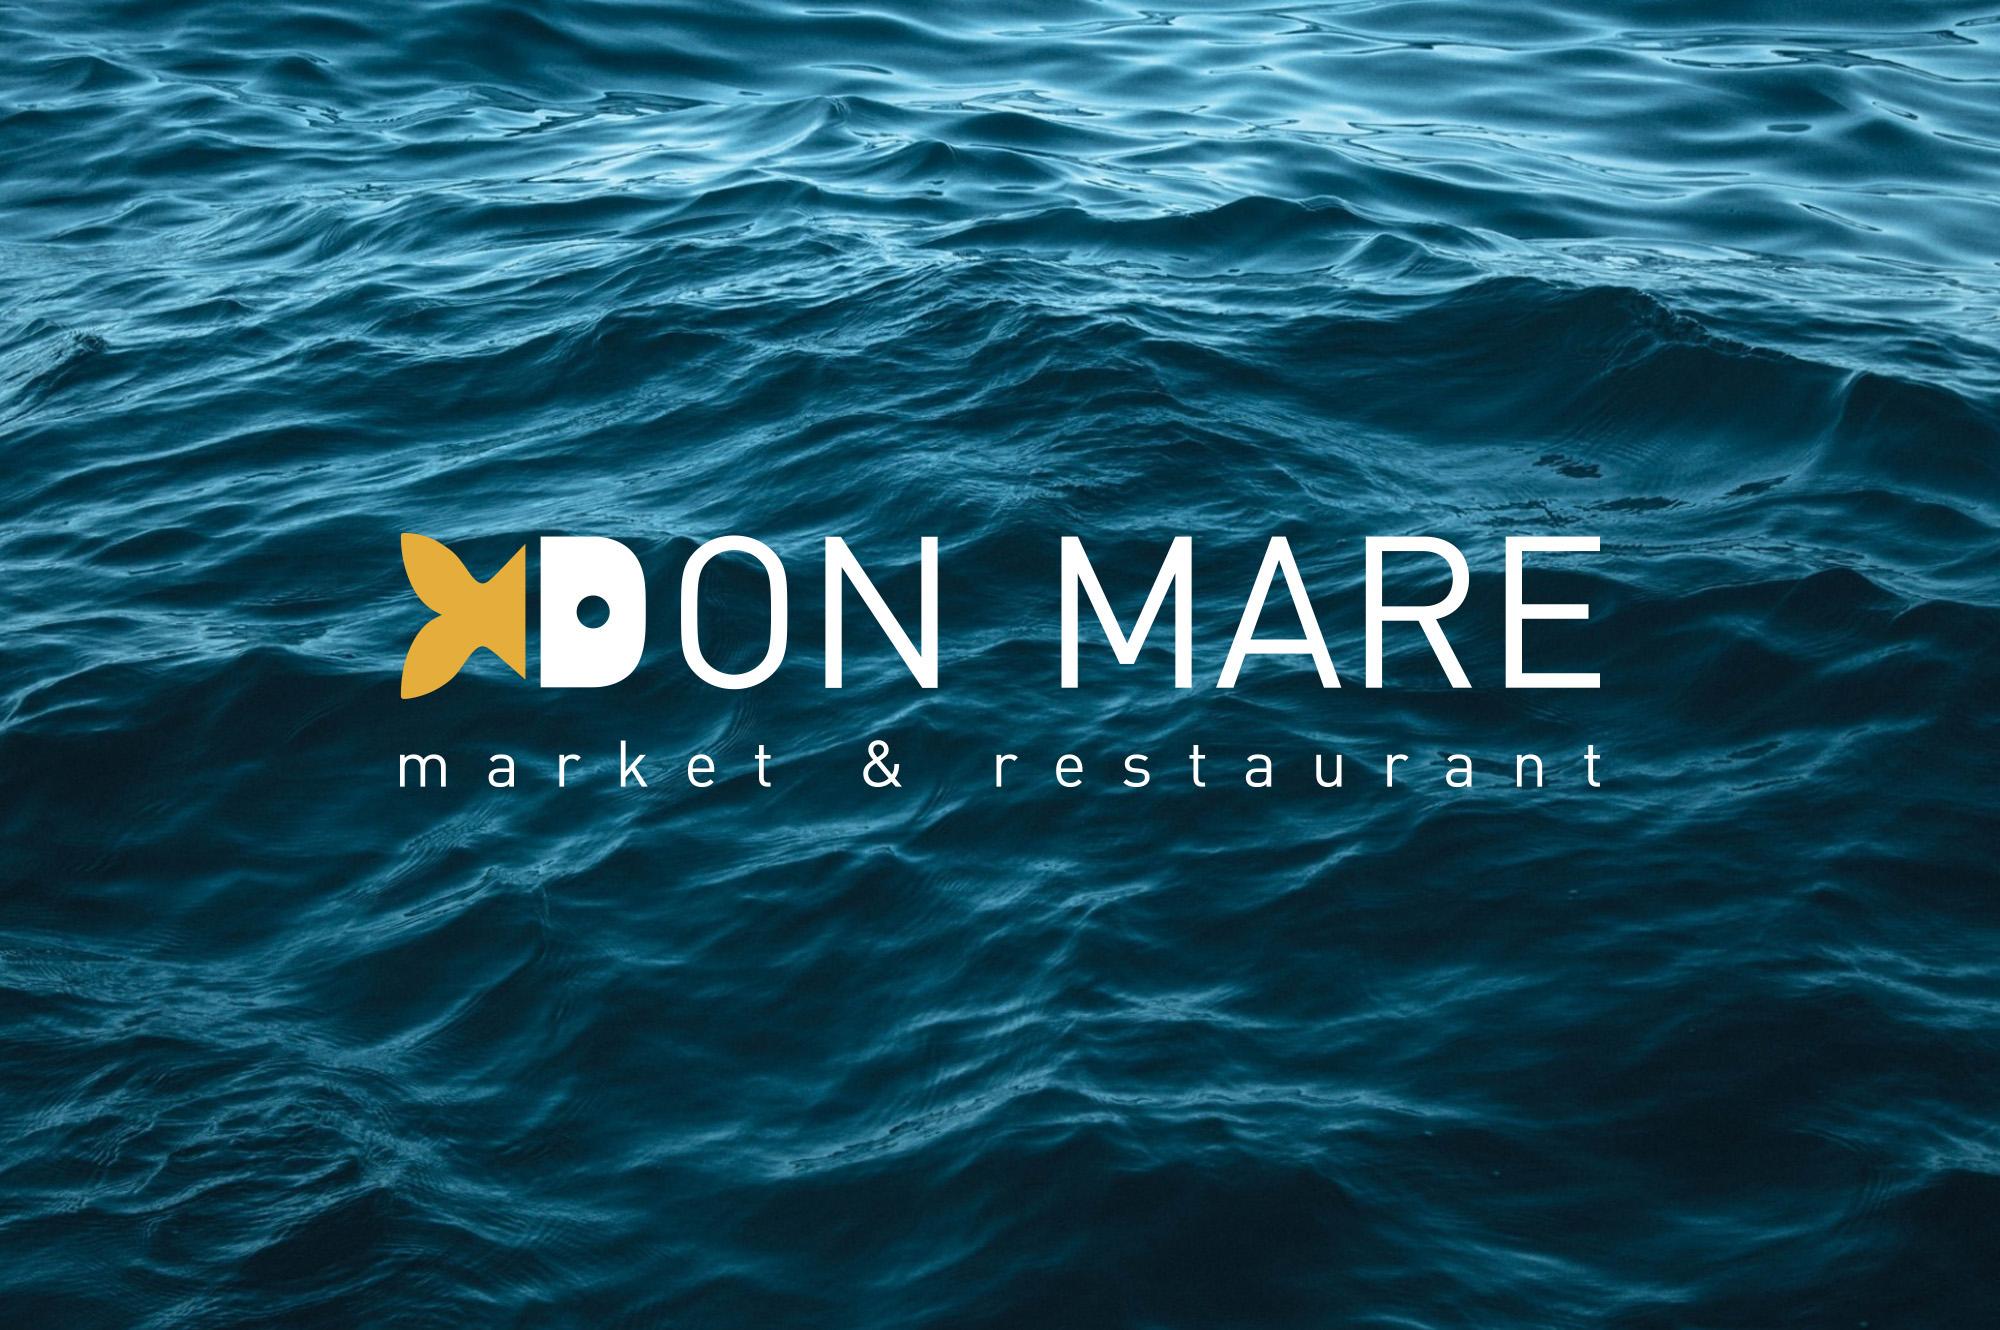 Разработка лого Don Mare